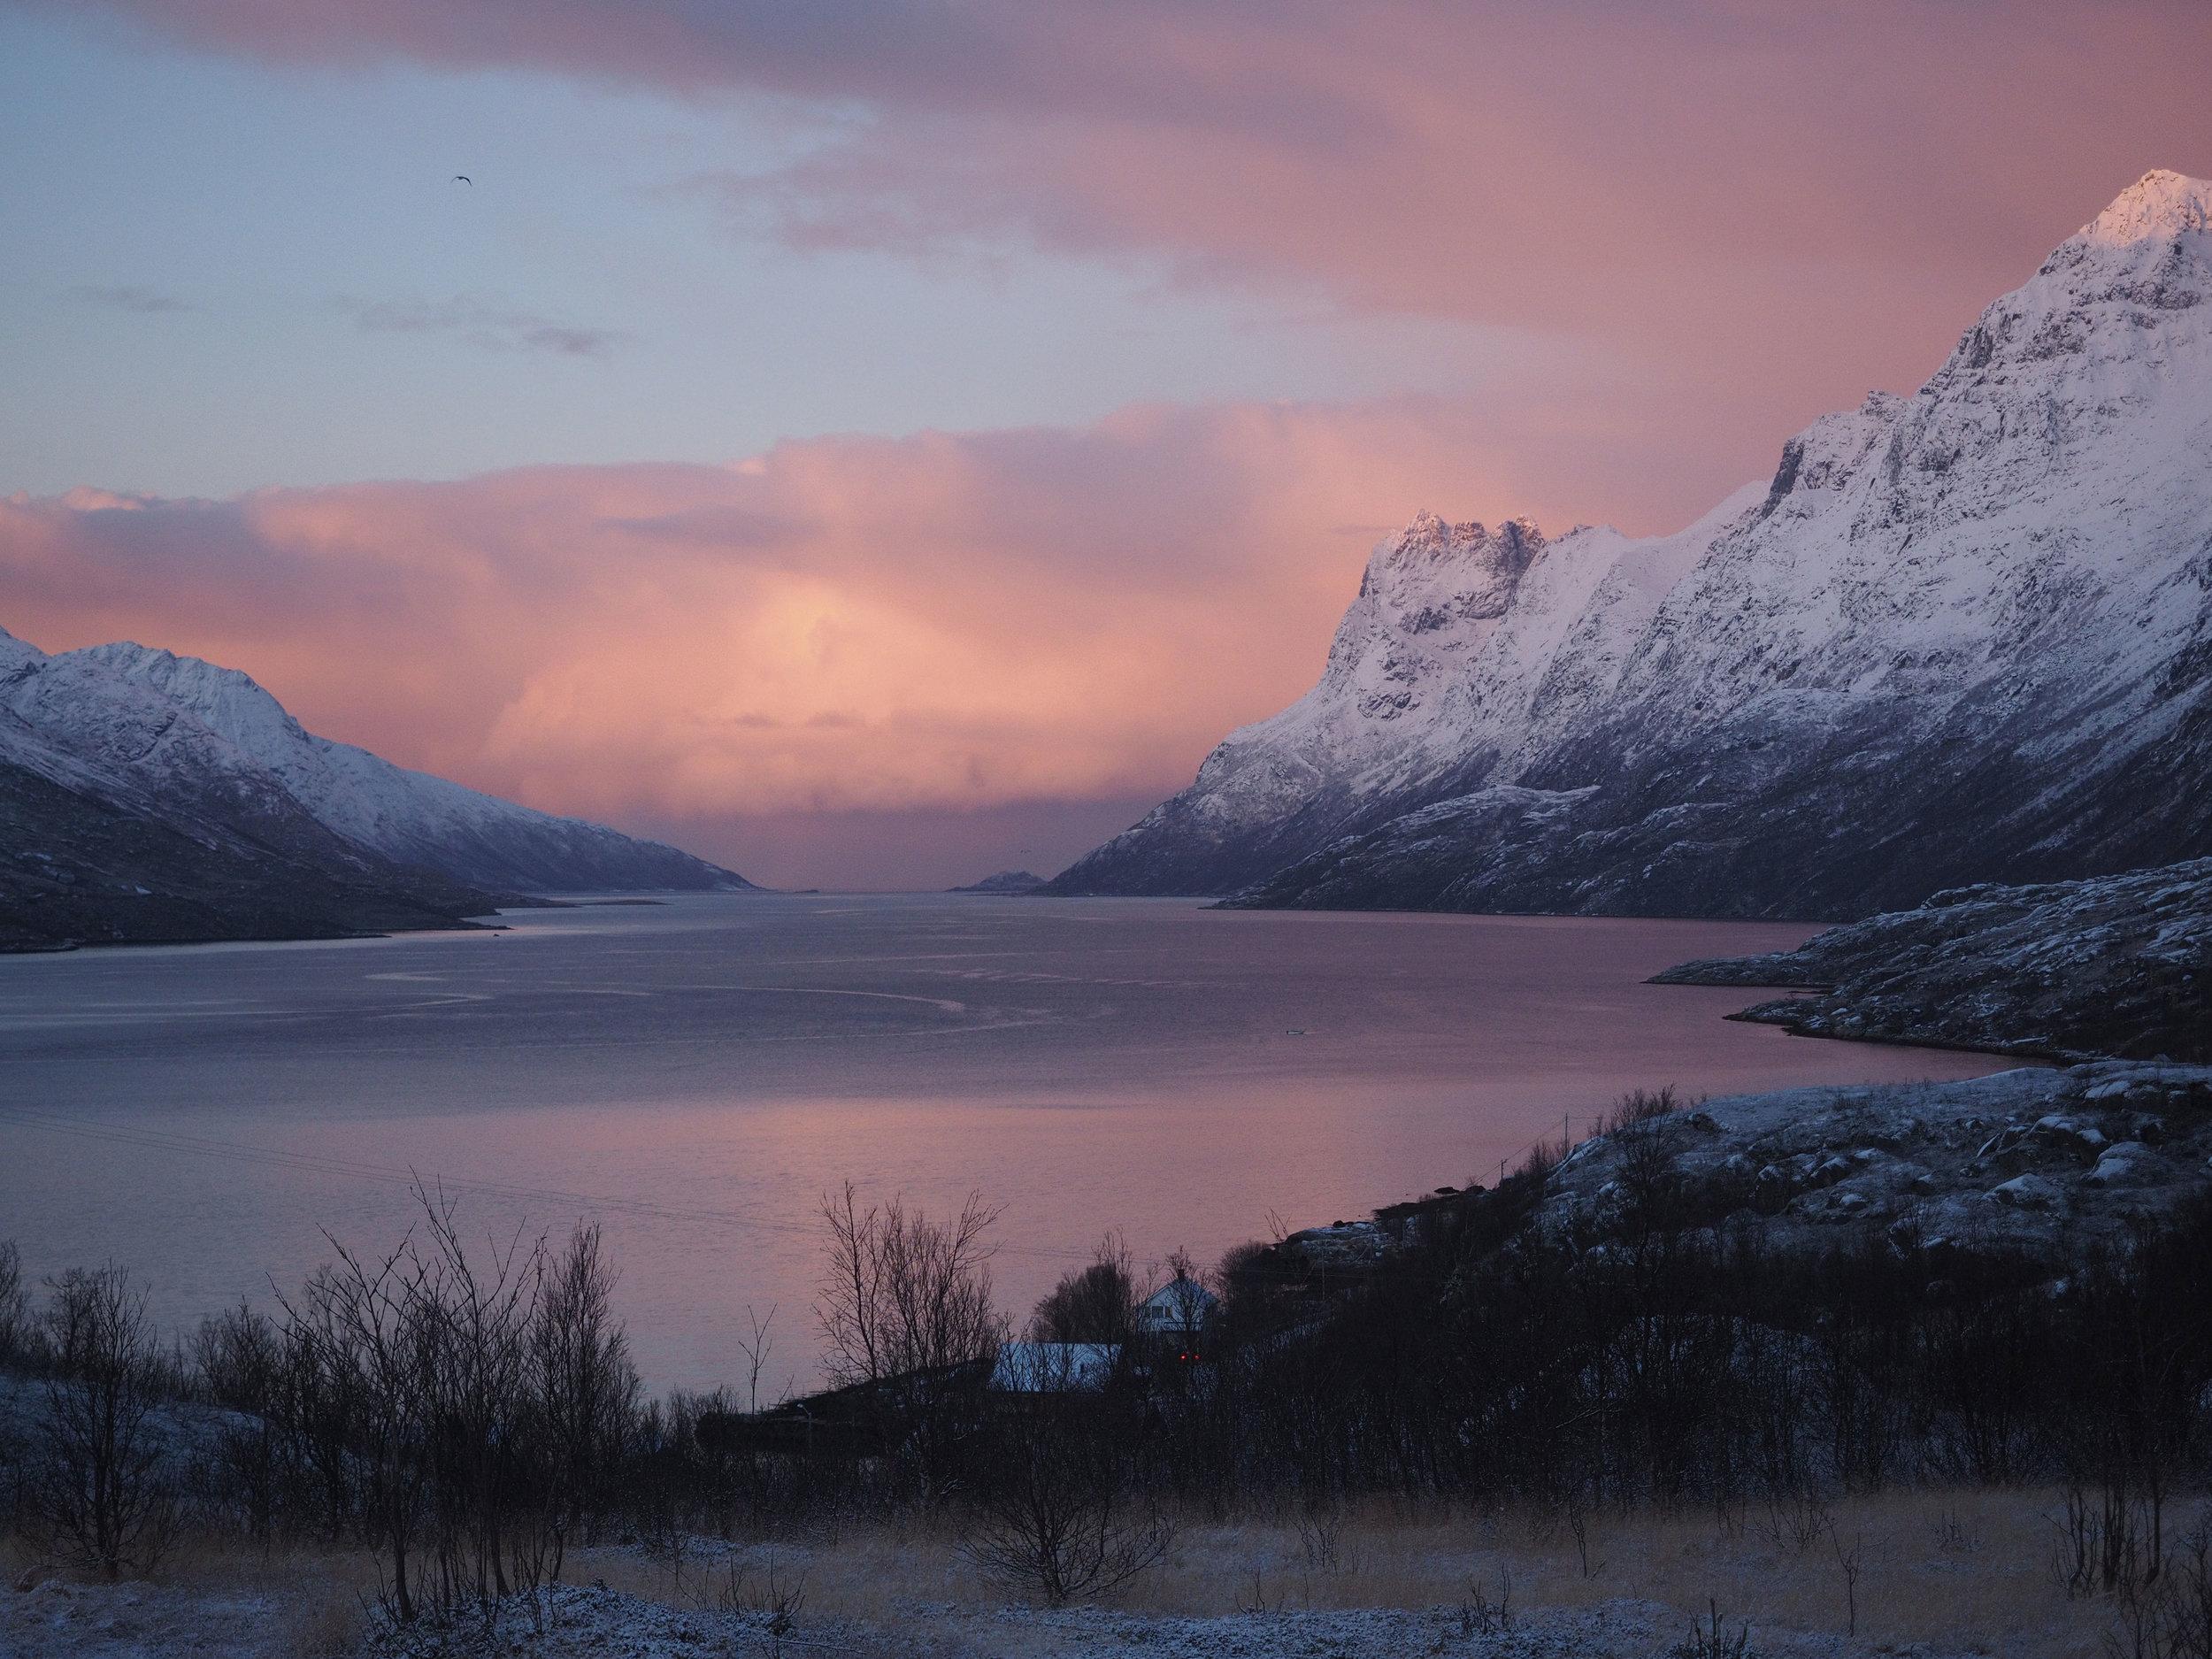 Scenery,-Sunset,-North-Norway_Christian-Engelke.jpg